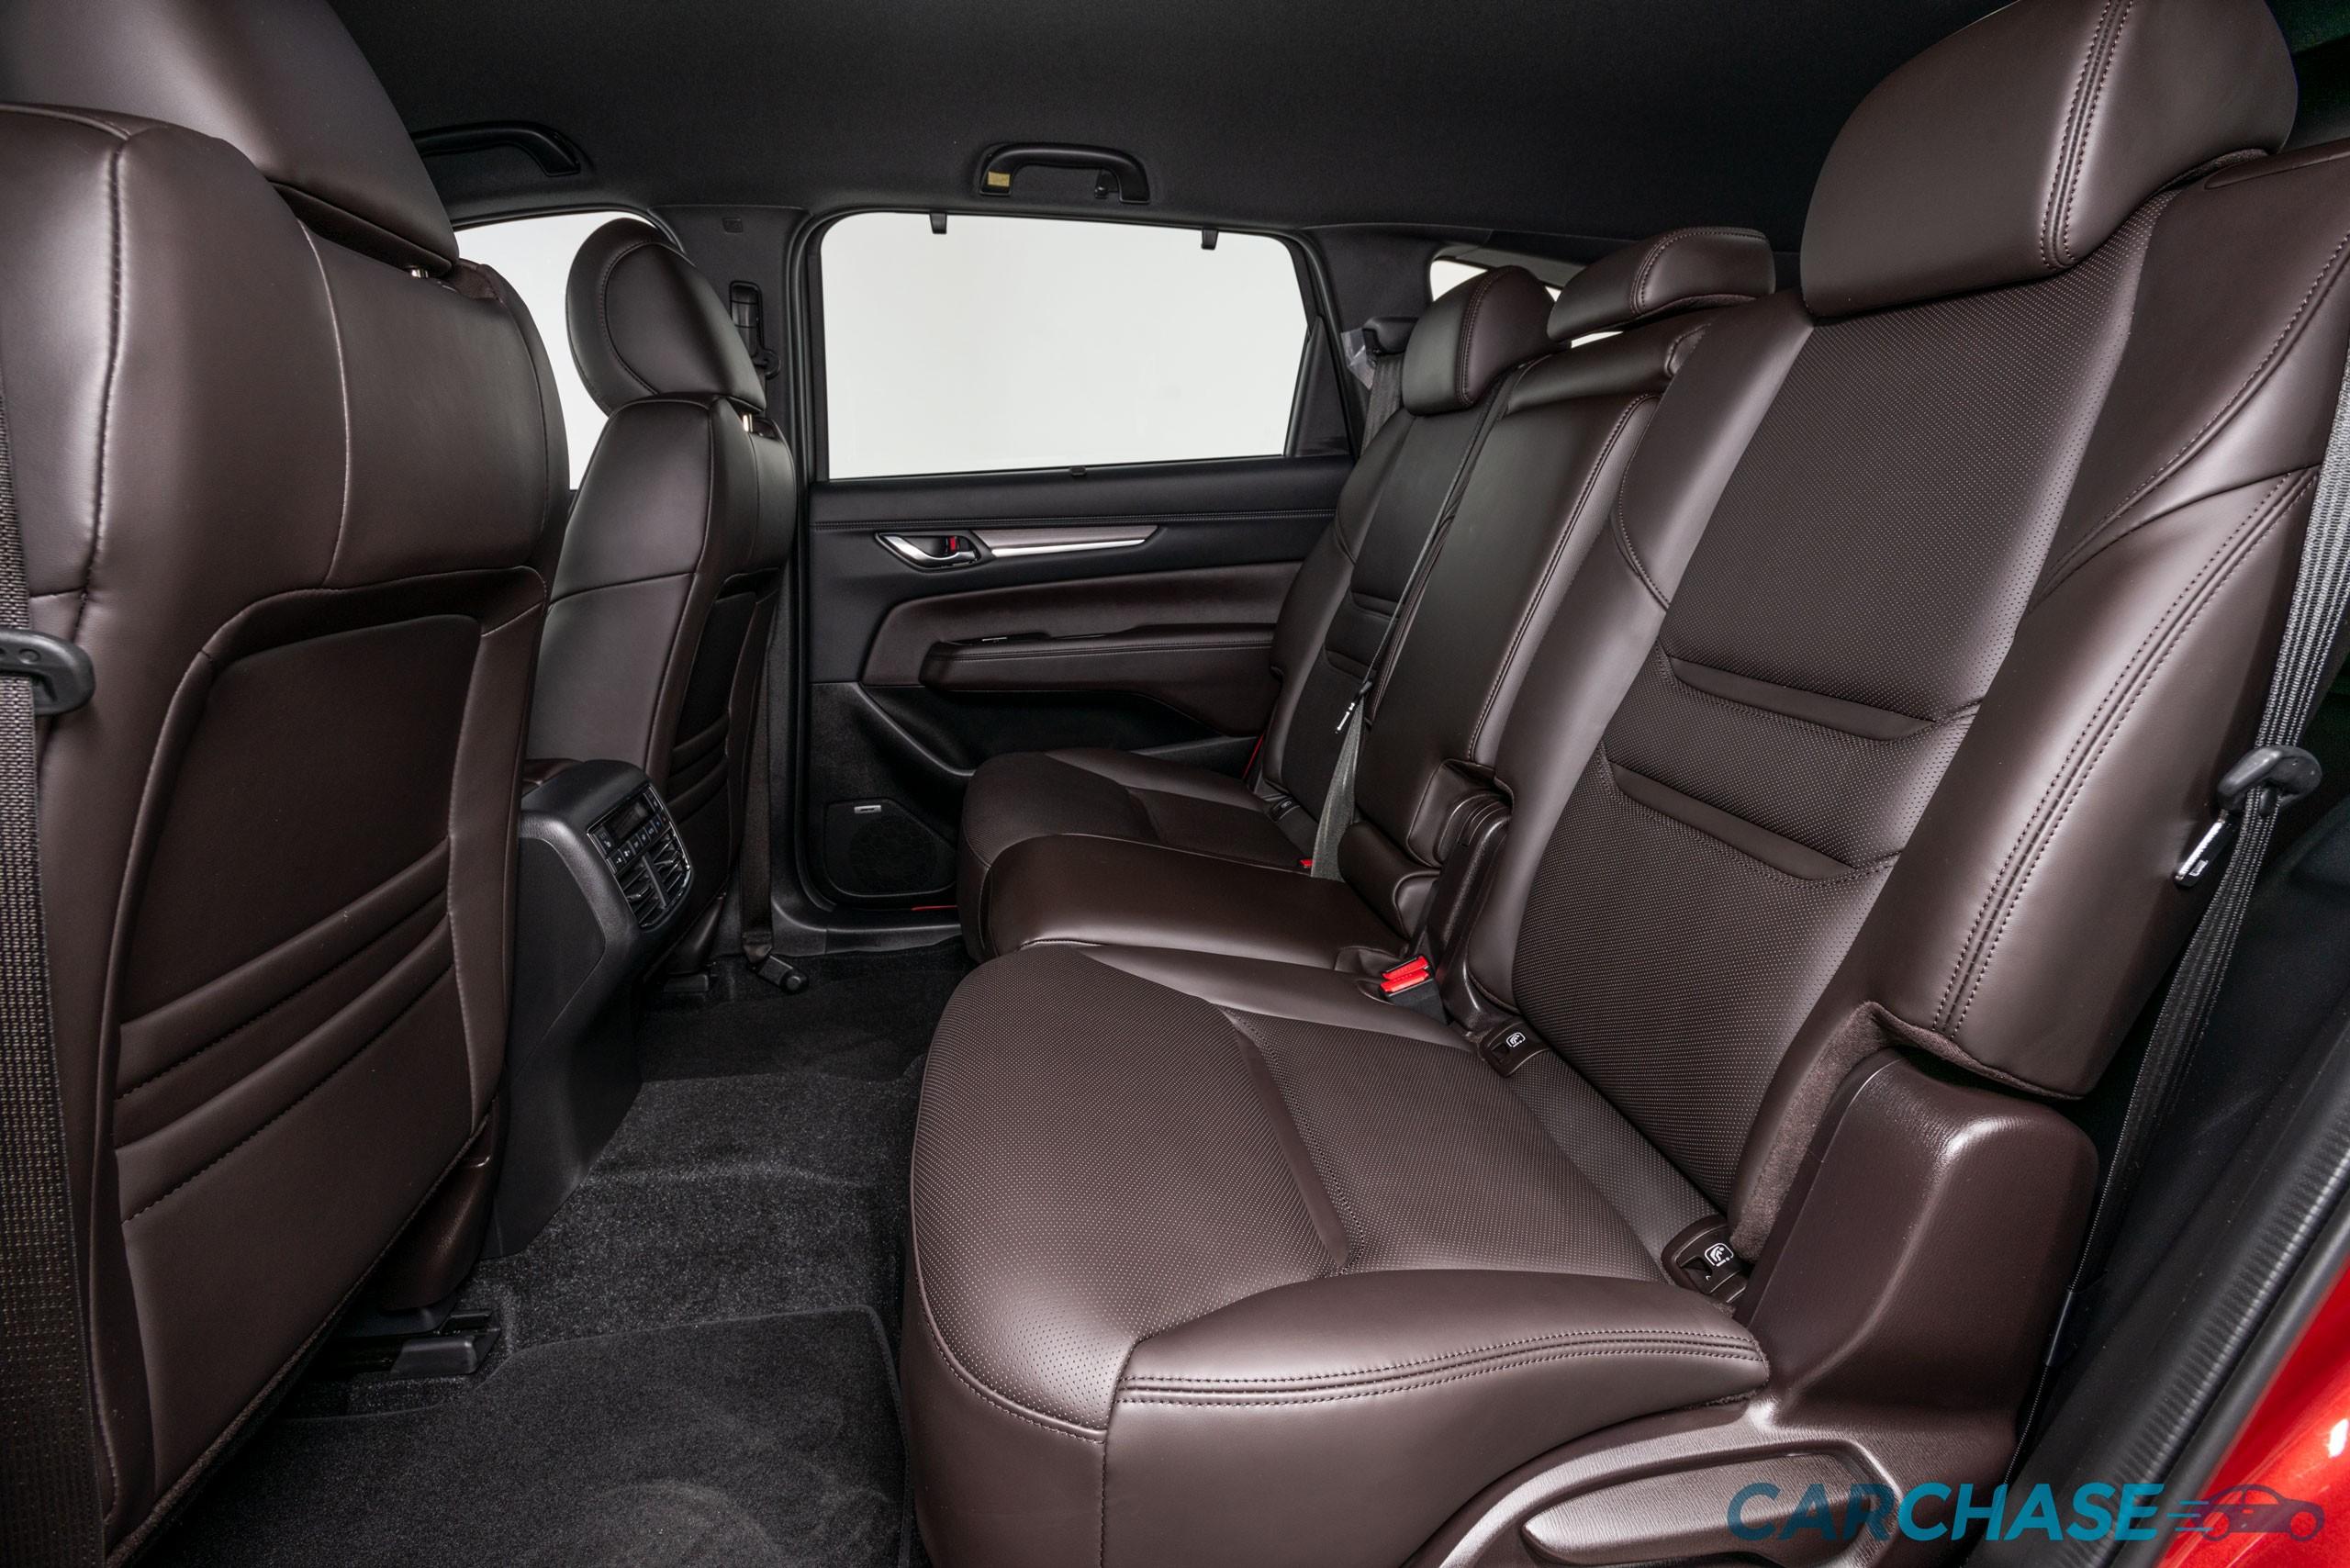 Image of passenger rear profile of 2018 Mazda CX-8 Asaki